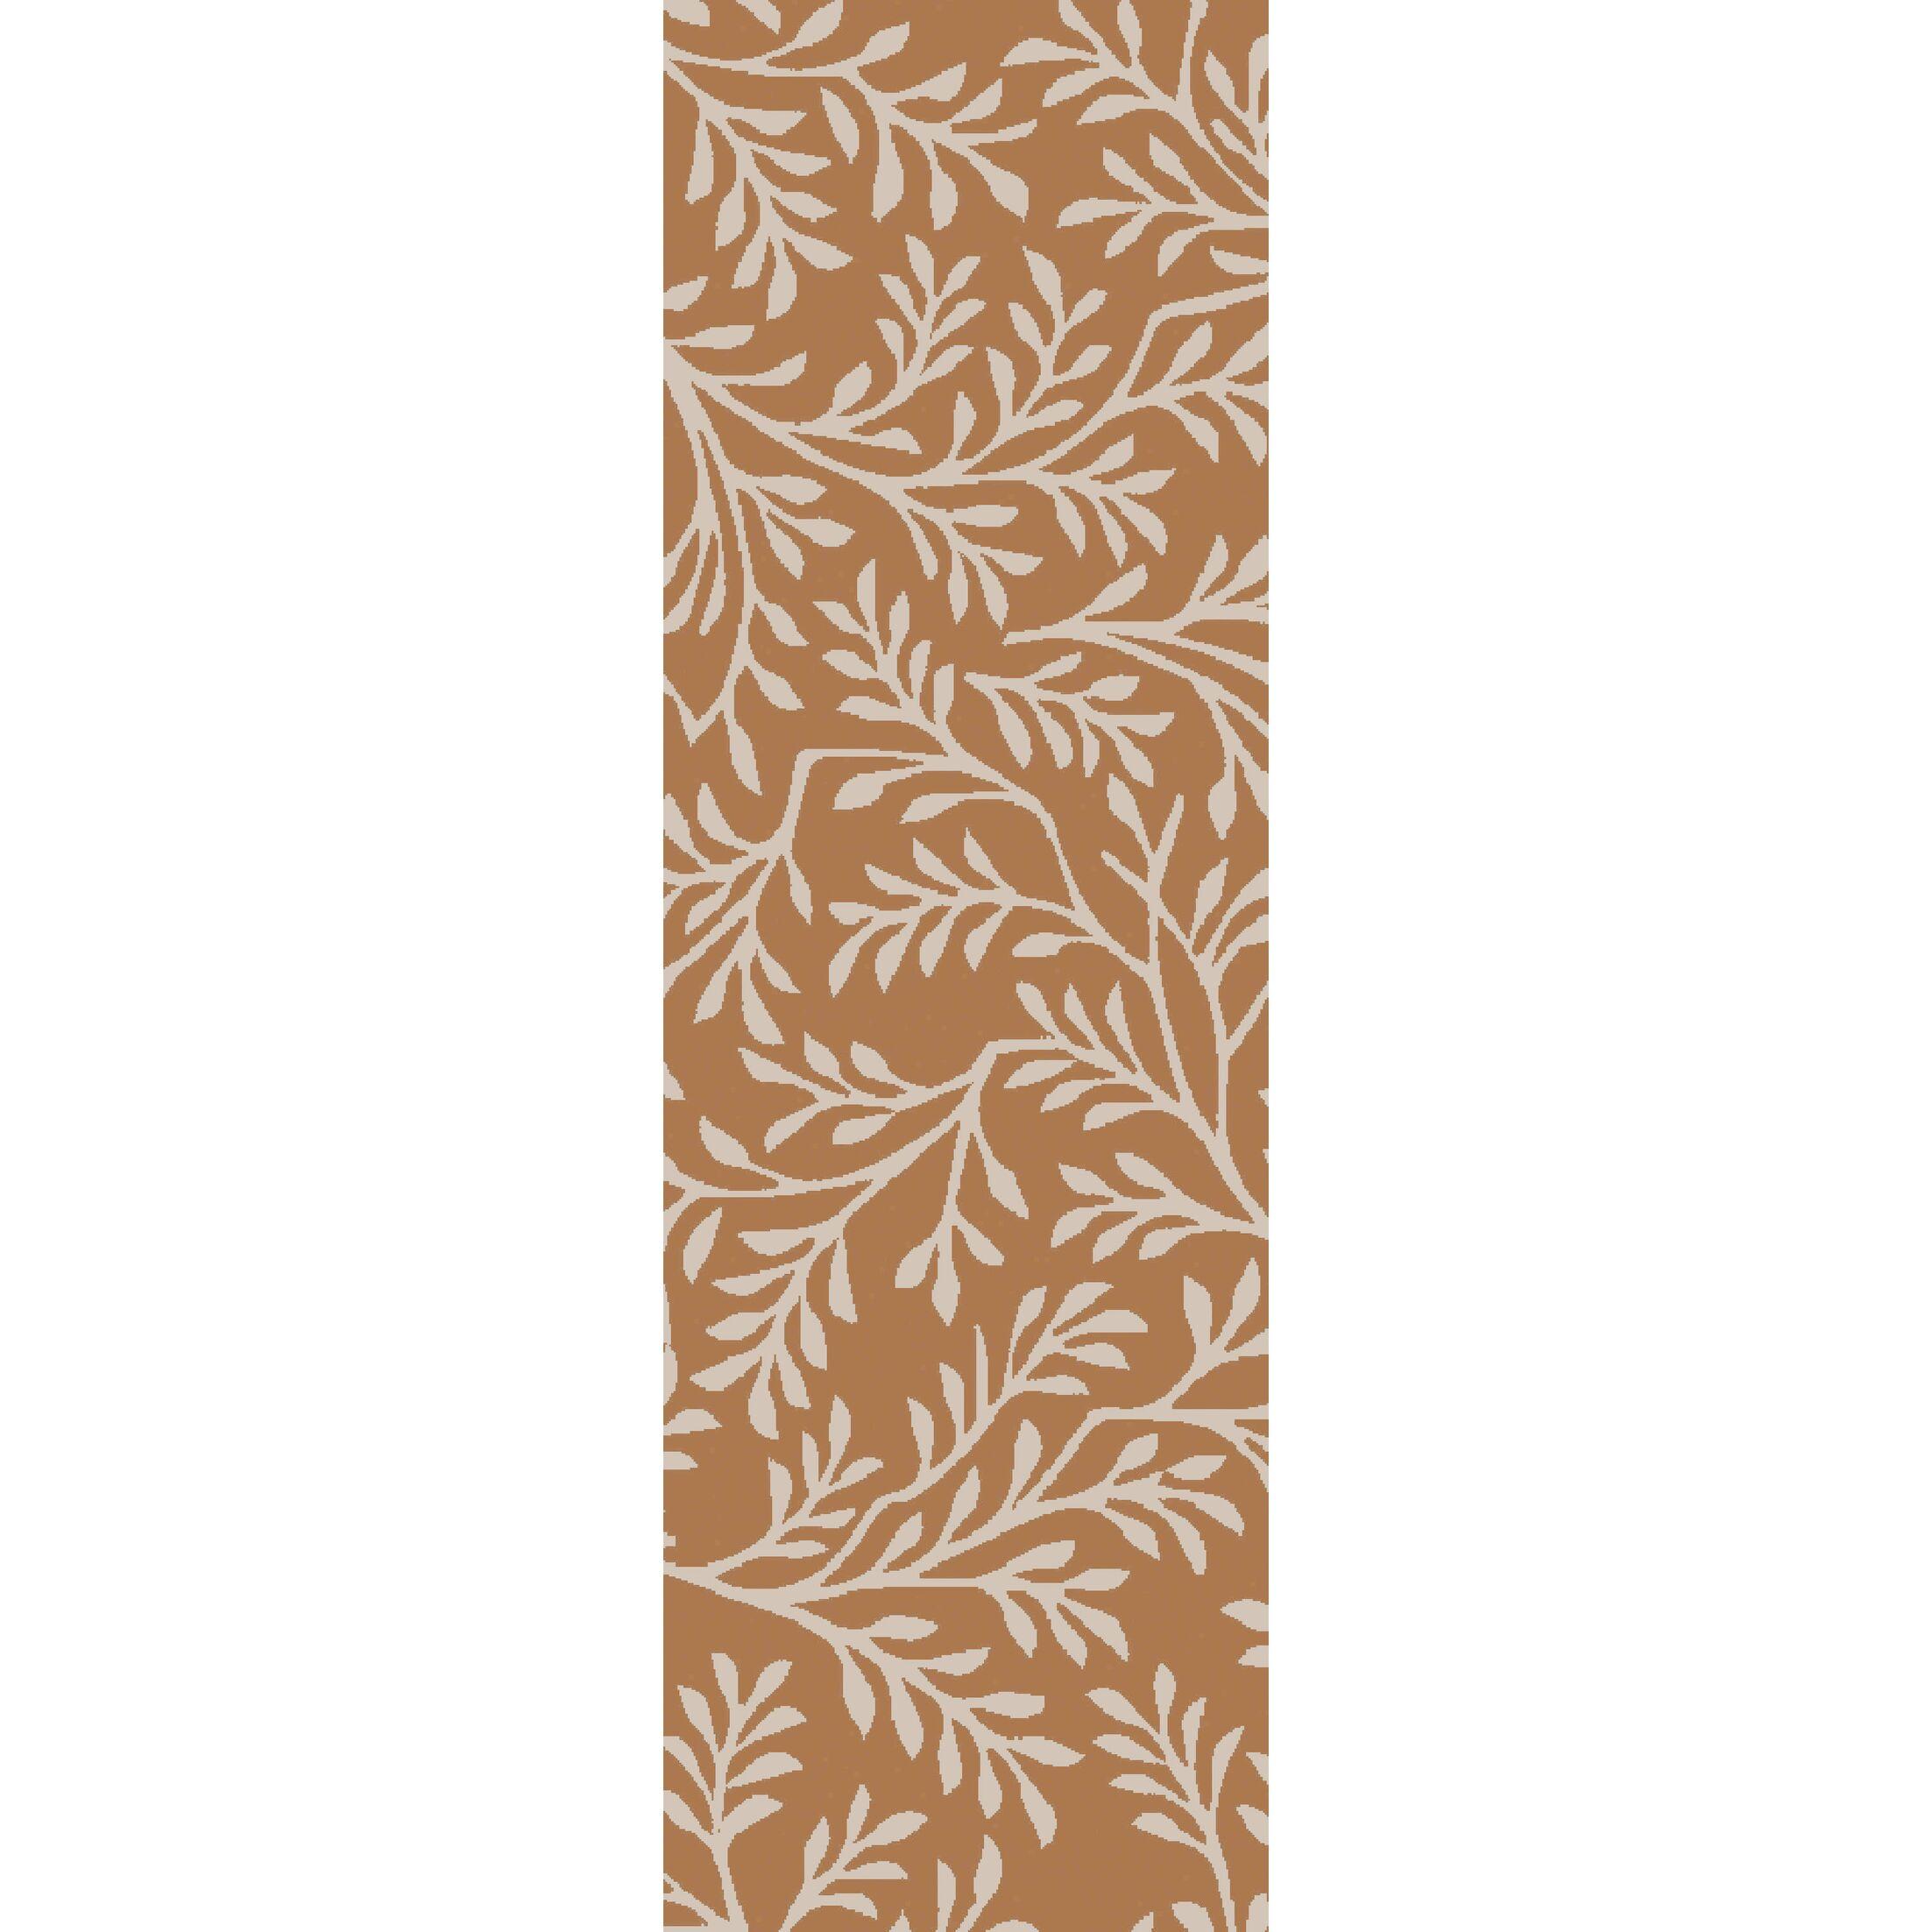 Grant Hand-Tufted Burnt Orange/Beige Area Rug Rug Size: Rectangle 8' x 11'